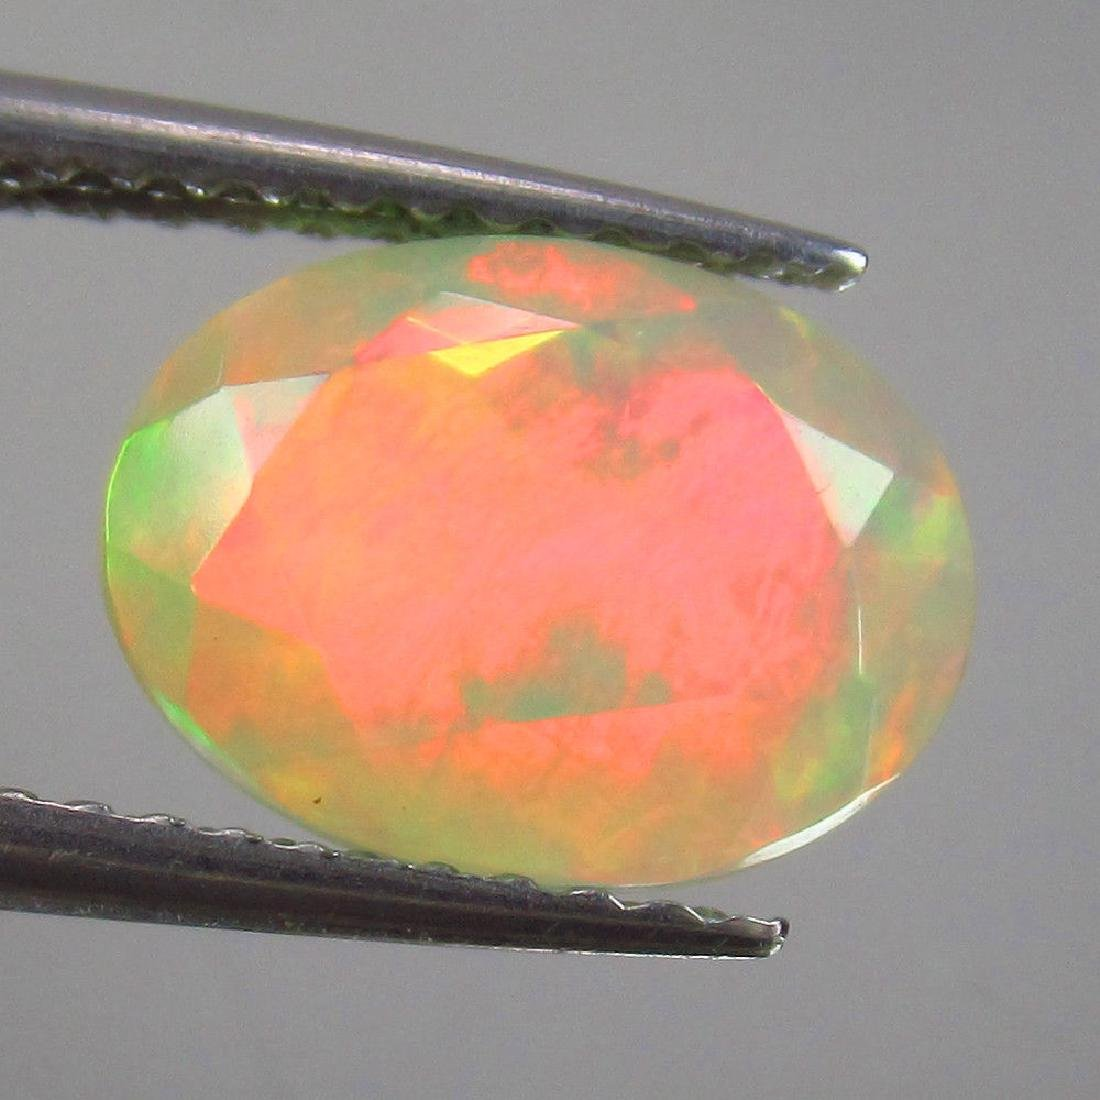 1.79 Carat Natural Loose Faceted Welo Opal